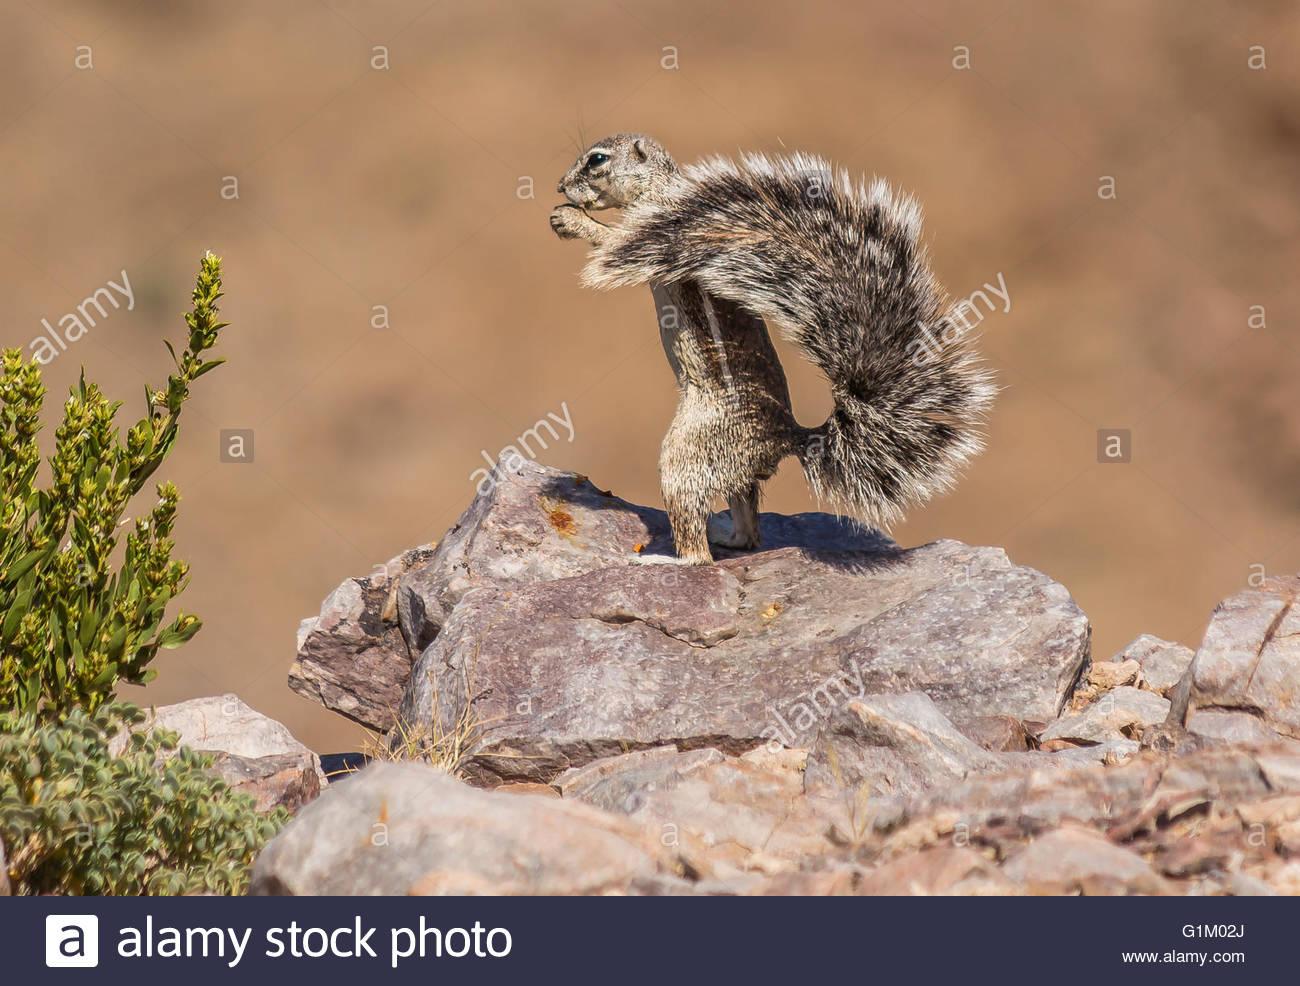 Namibian Ground Squirrel - Stock Image